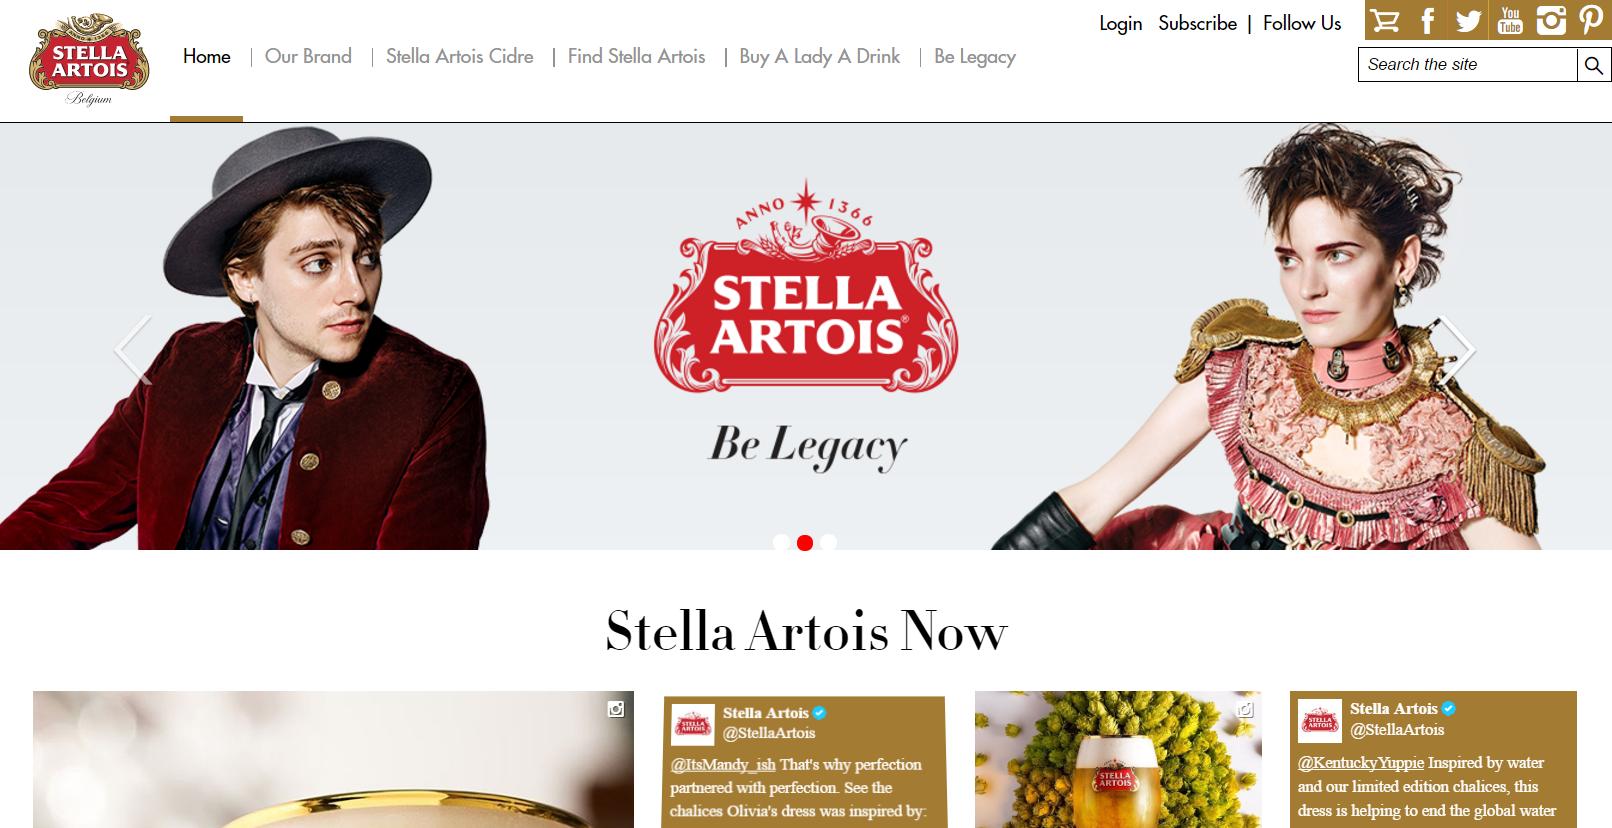 Tagine examples: Stella Artois, Be Legacy